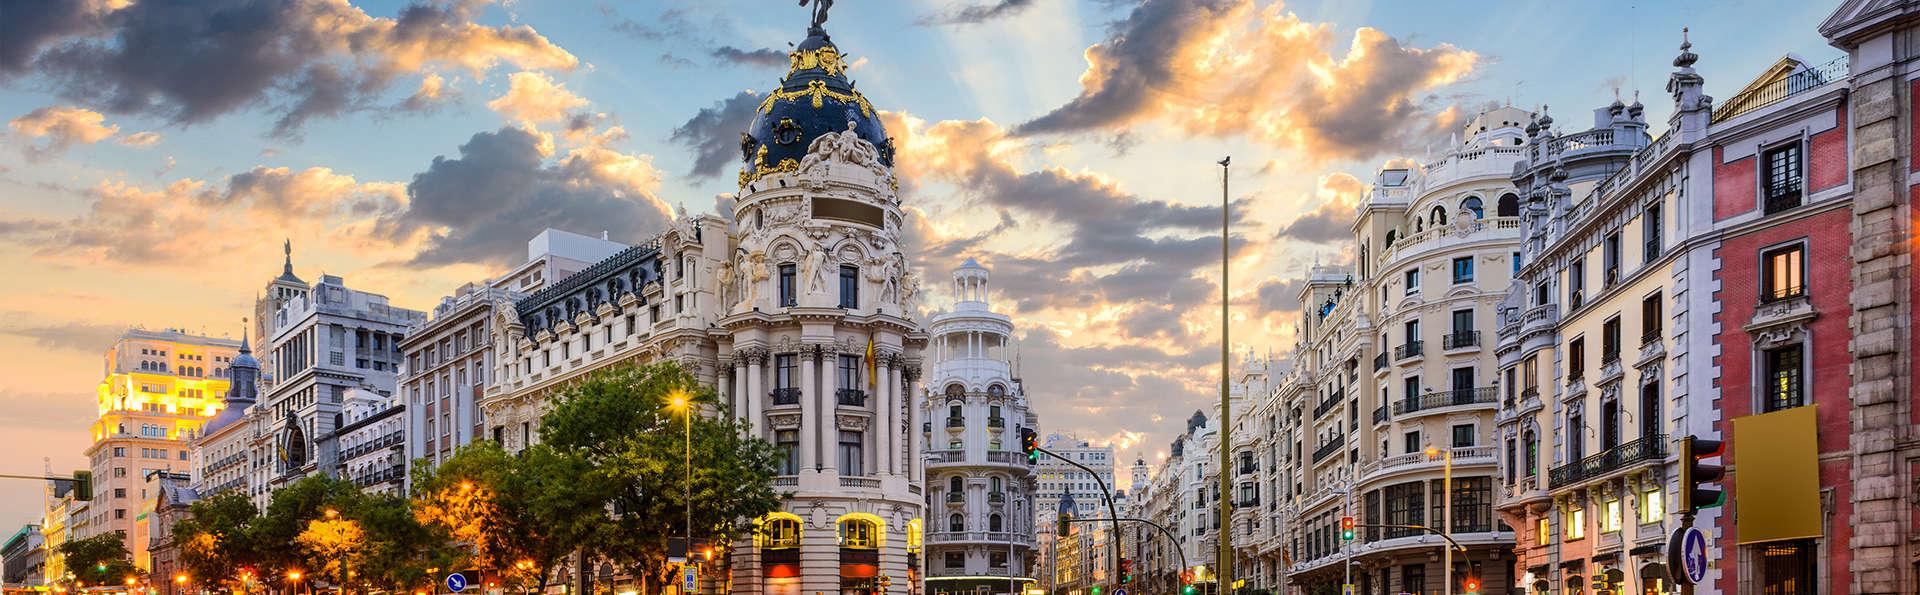 Hotel Las Artes - EDIT_madrid1.jpg